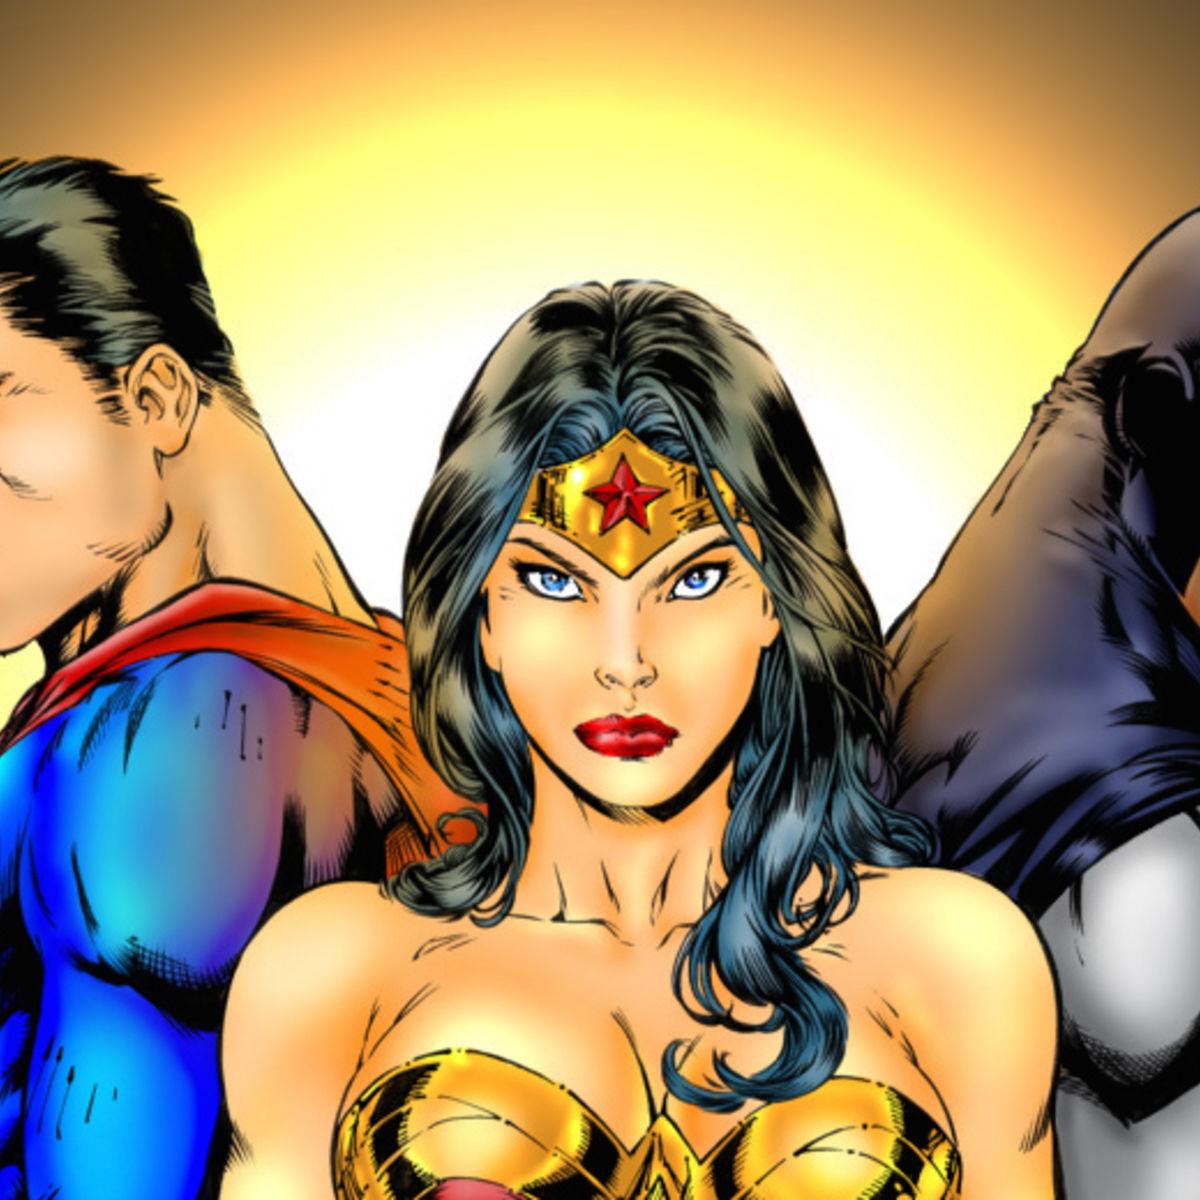 1945073-superman_wonder_woman_batman_by_sporedesigns.jpg